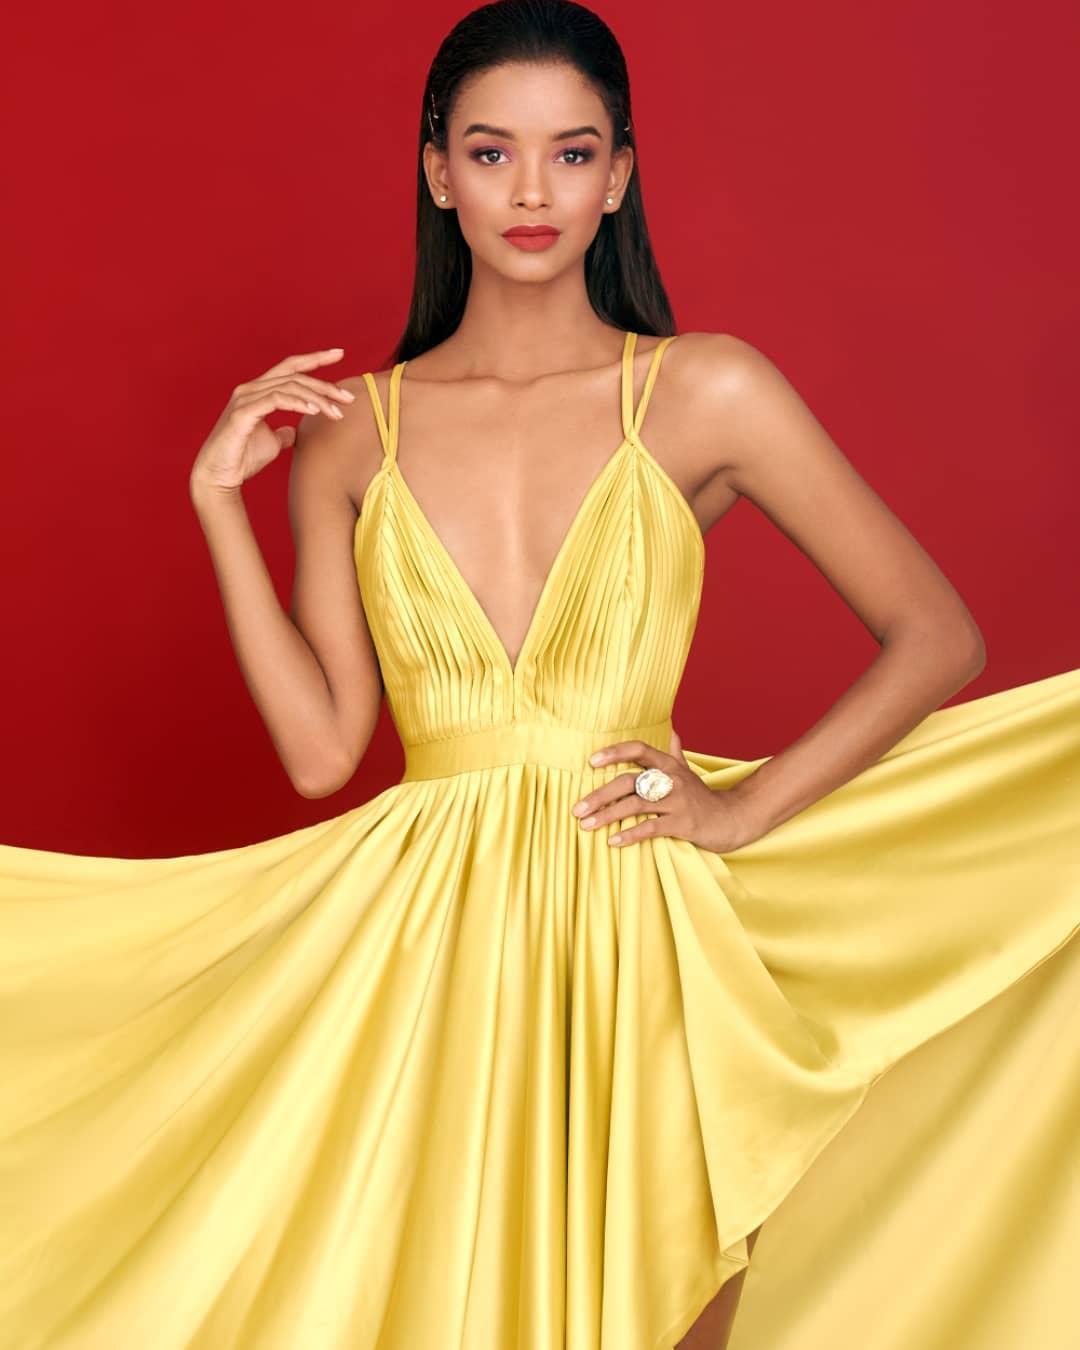 carolina londono, top 16 de miss colombia universo 2020. Carolo19